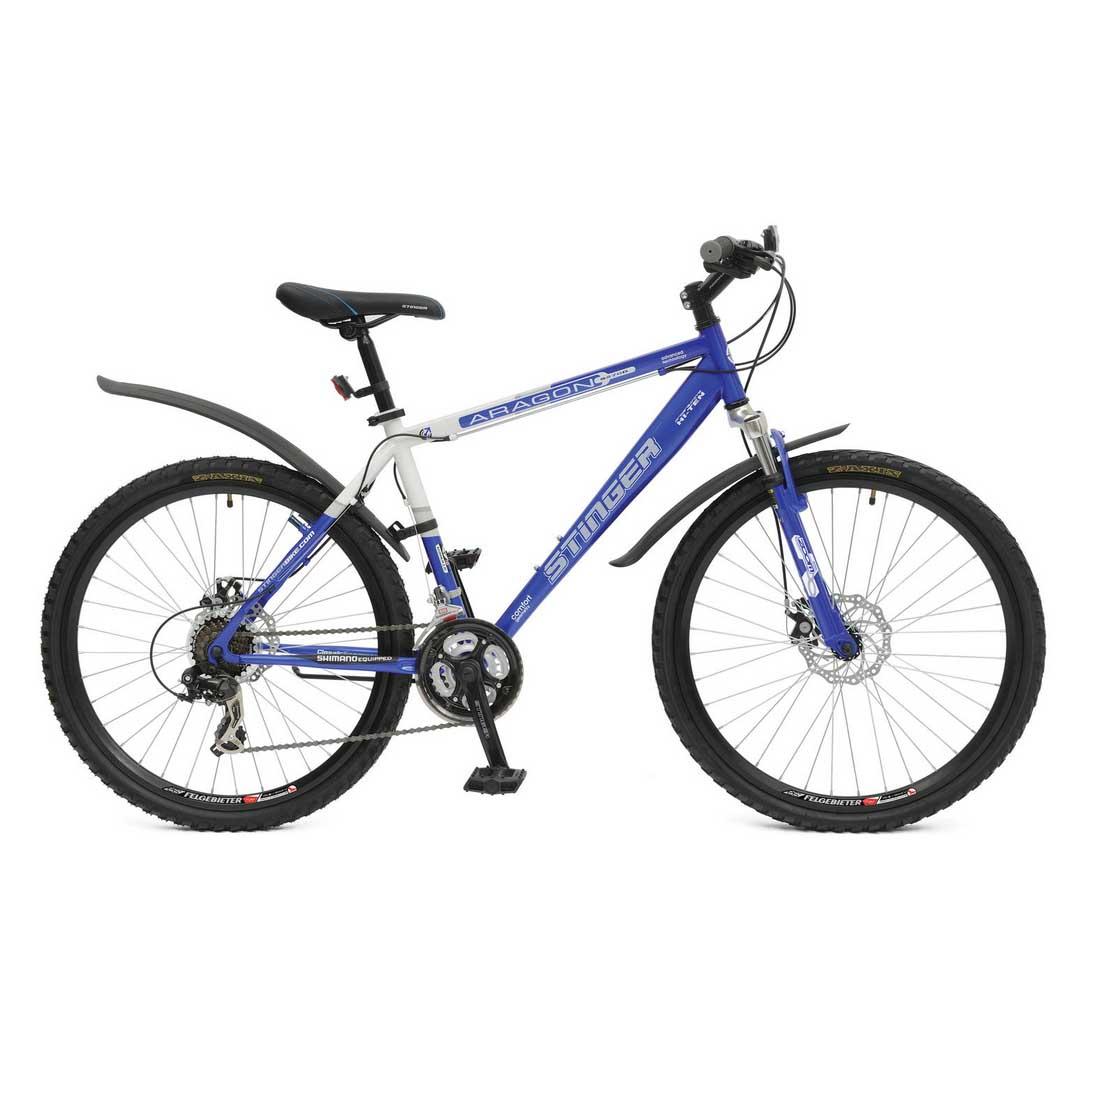 "Велосипед Stinger 26"" Х50760 Арагон S270D хардт. 21ск. стал.рама 18д. голубо-белый"